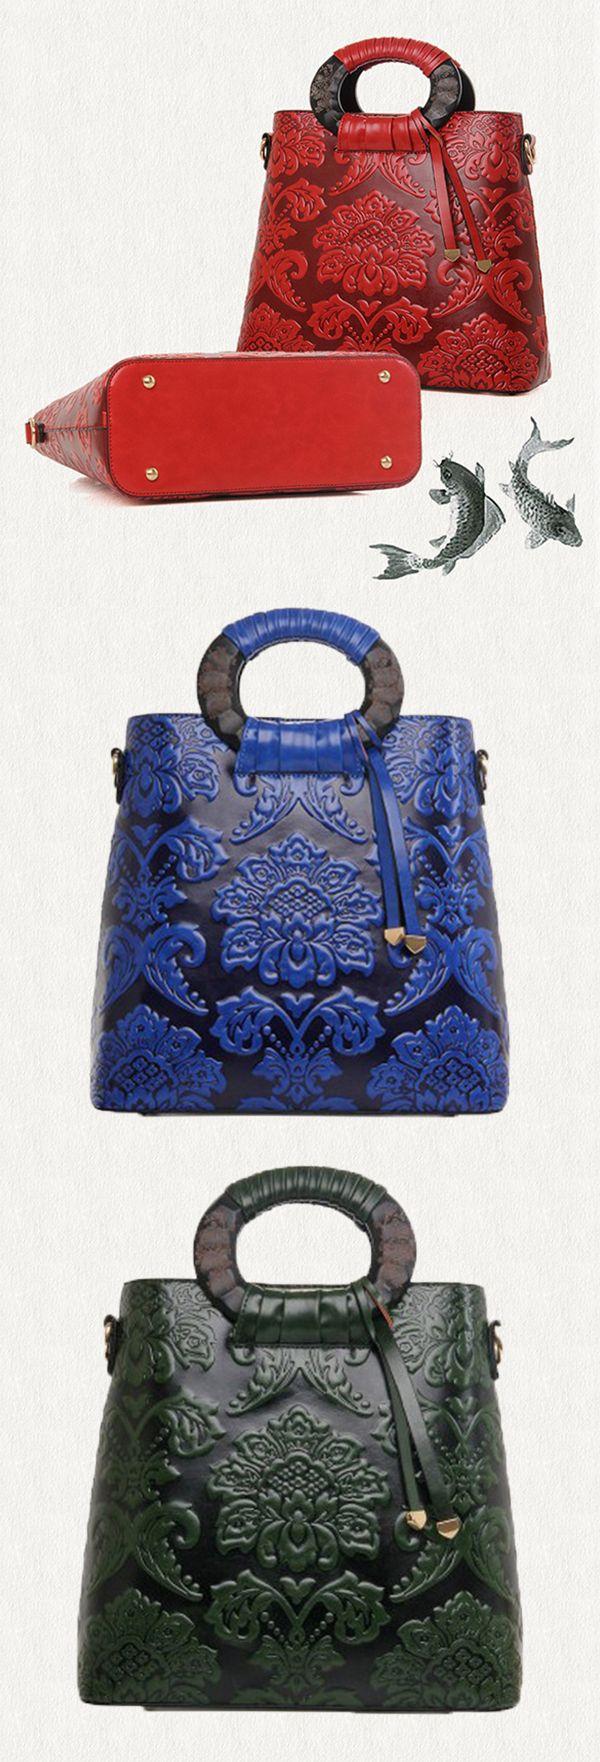 Women Floral Elegant National Handbag Embroidery Crossbody Bag